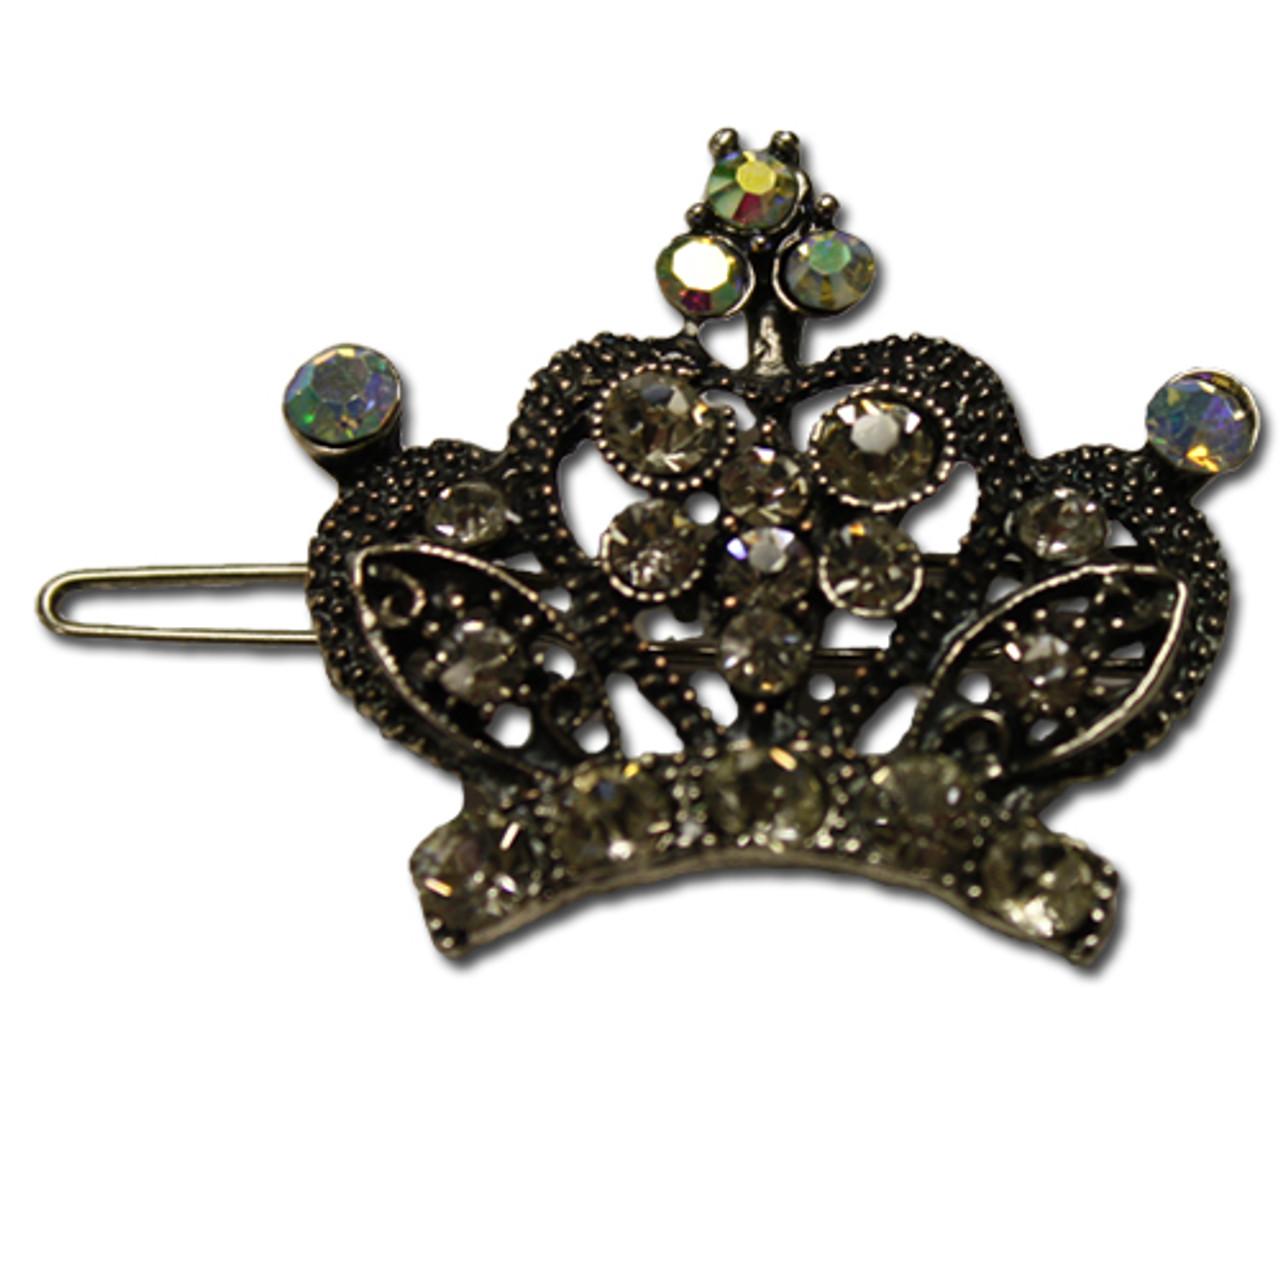 Princess tiara barrette